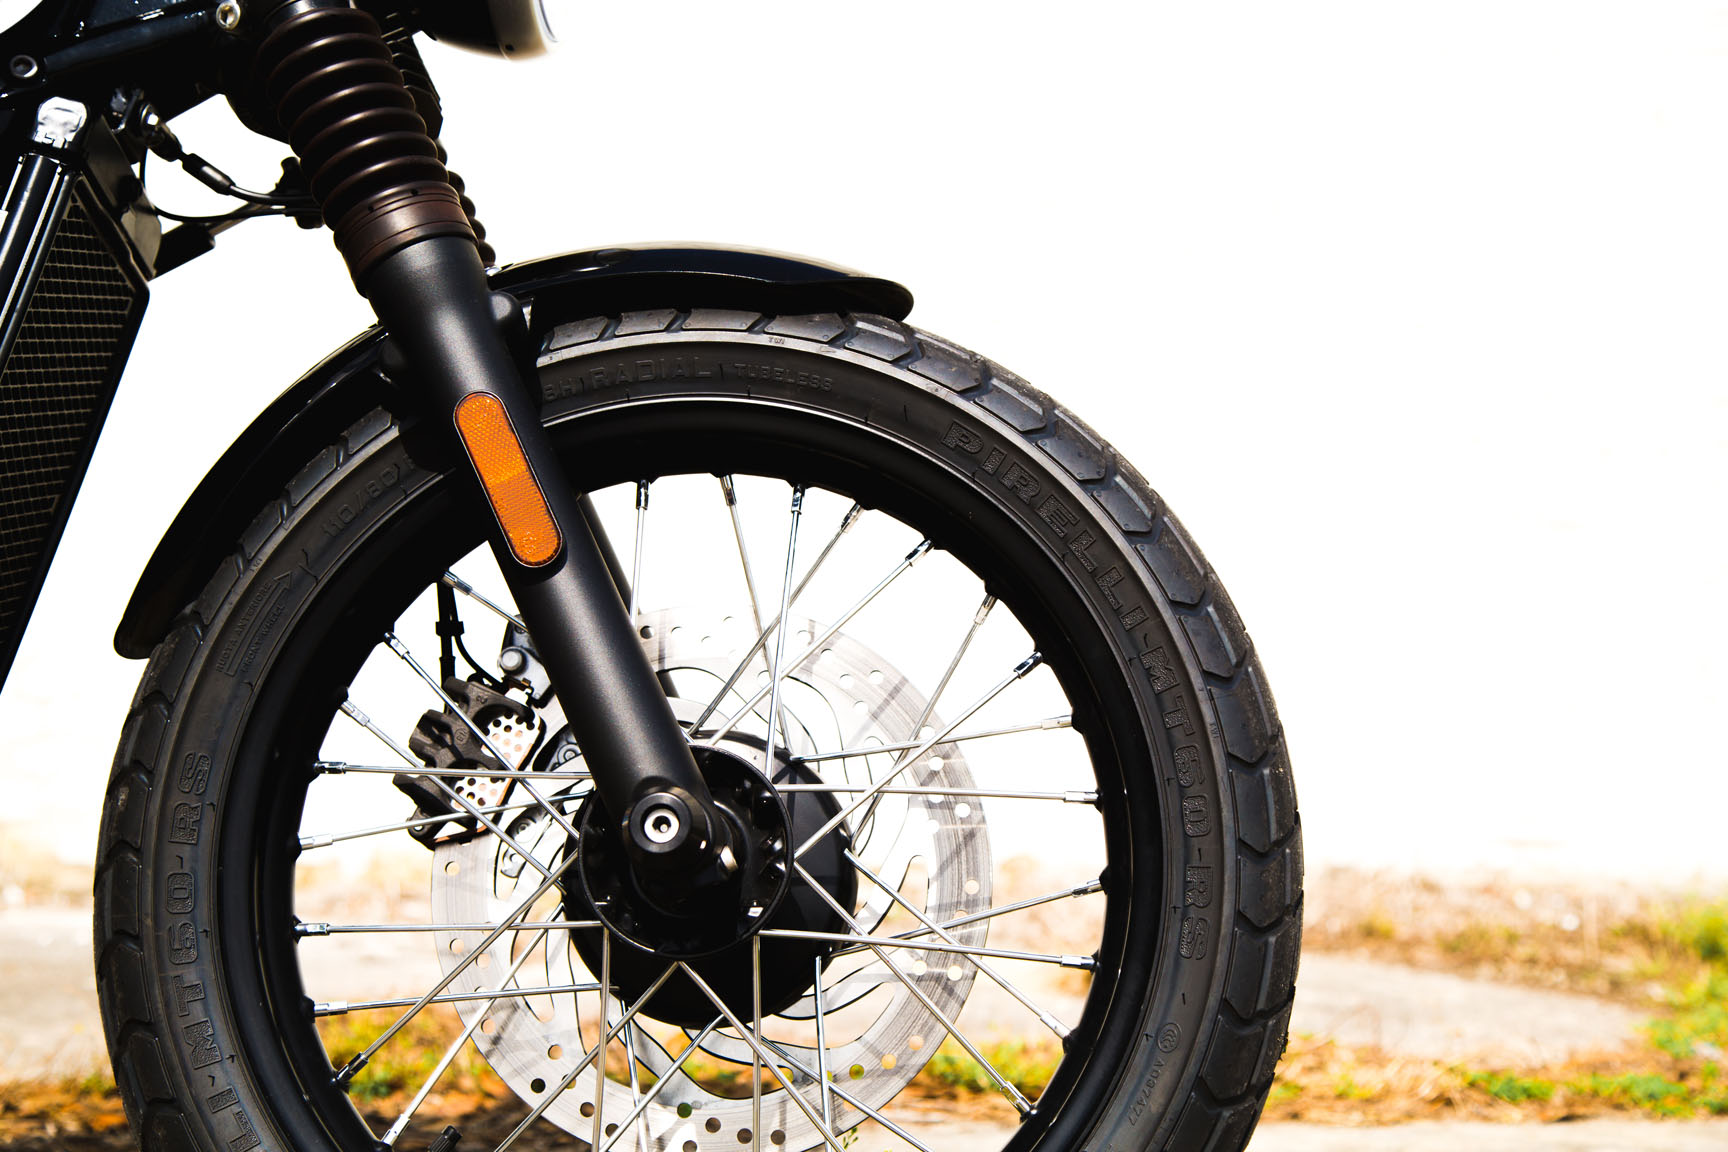 SMC-Lakeland-Lifestyle-00433.jpg